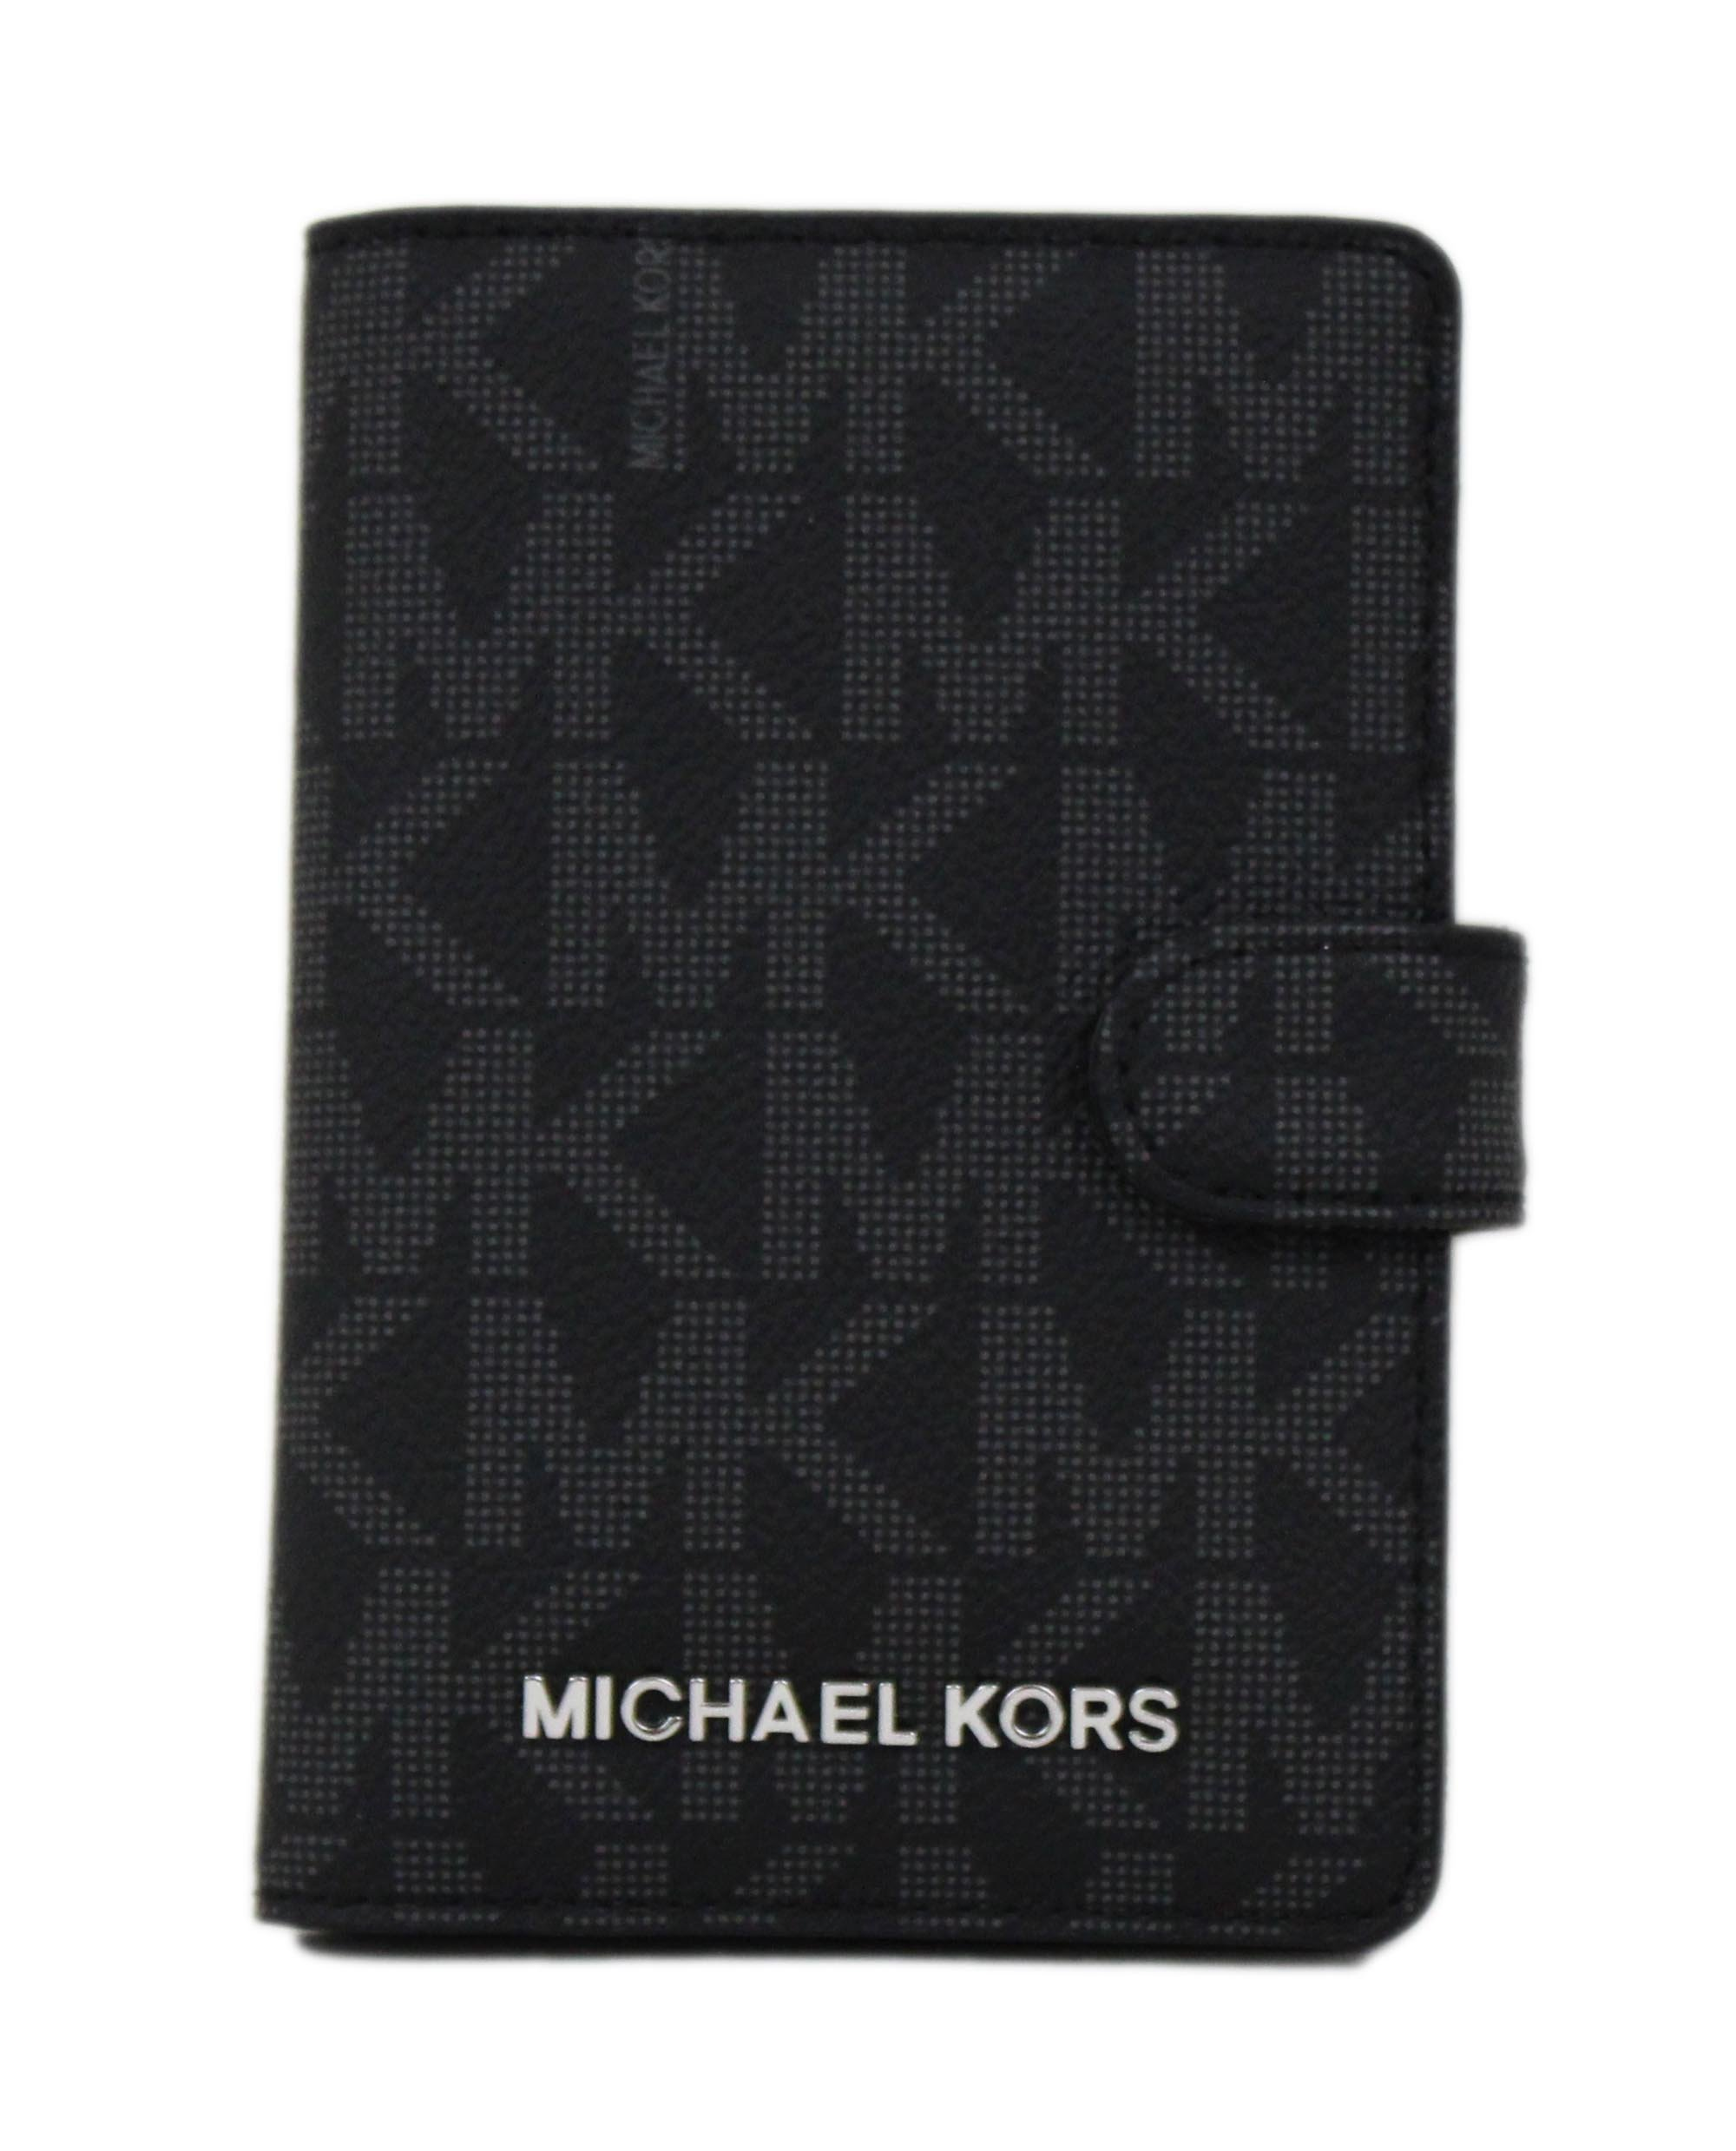 Michael Kors Jet Set Travel Passport Case - Black